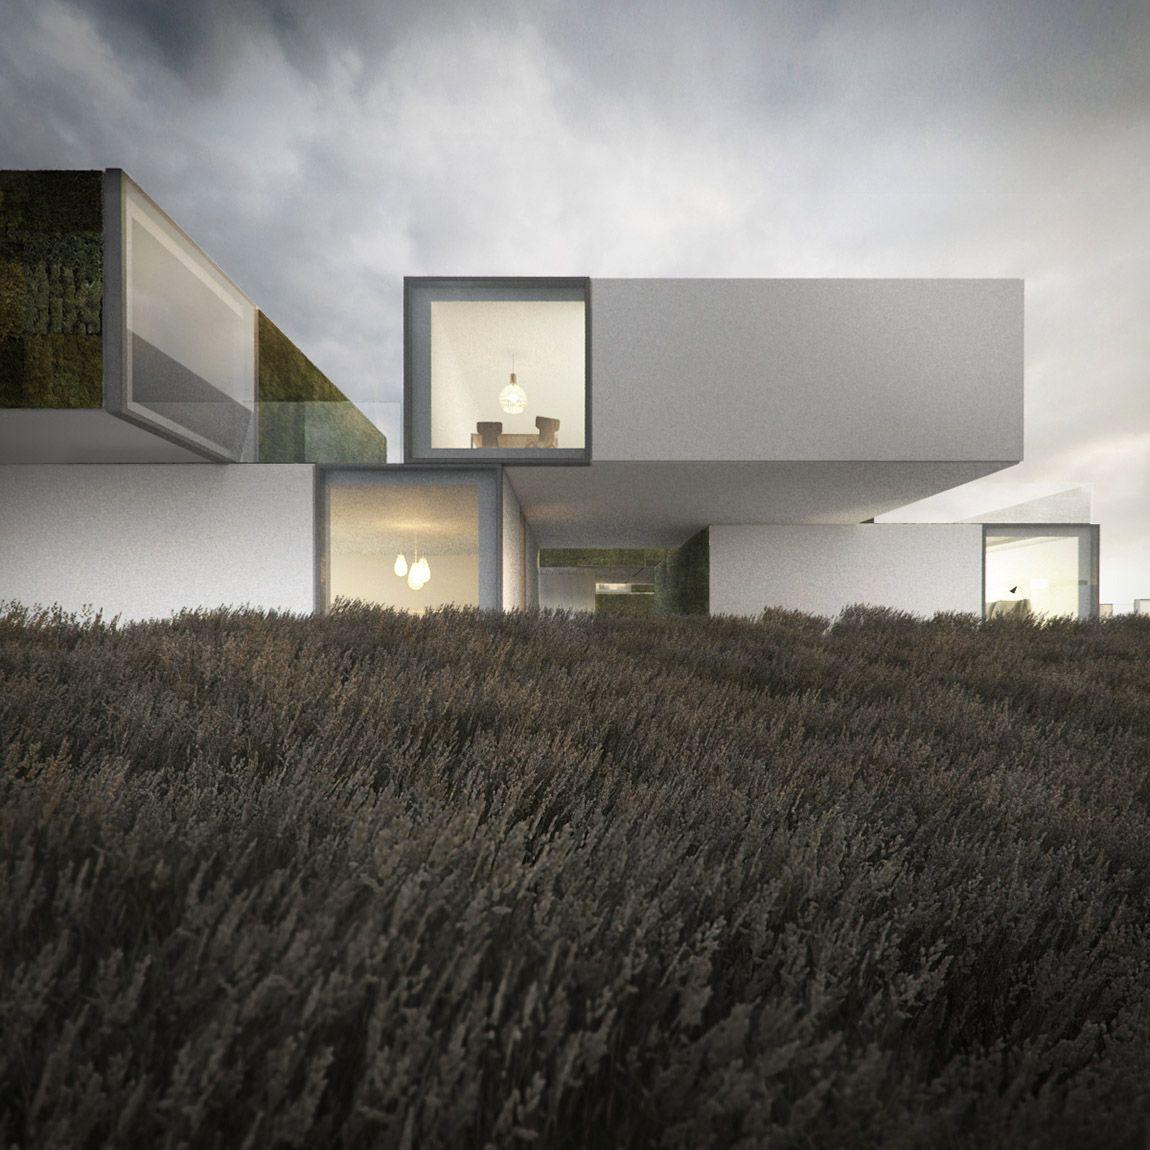 Urban planning mikolai adamus urban planning tissue for Casa minimalista pinterest